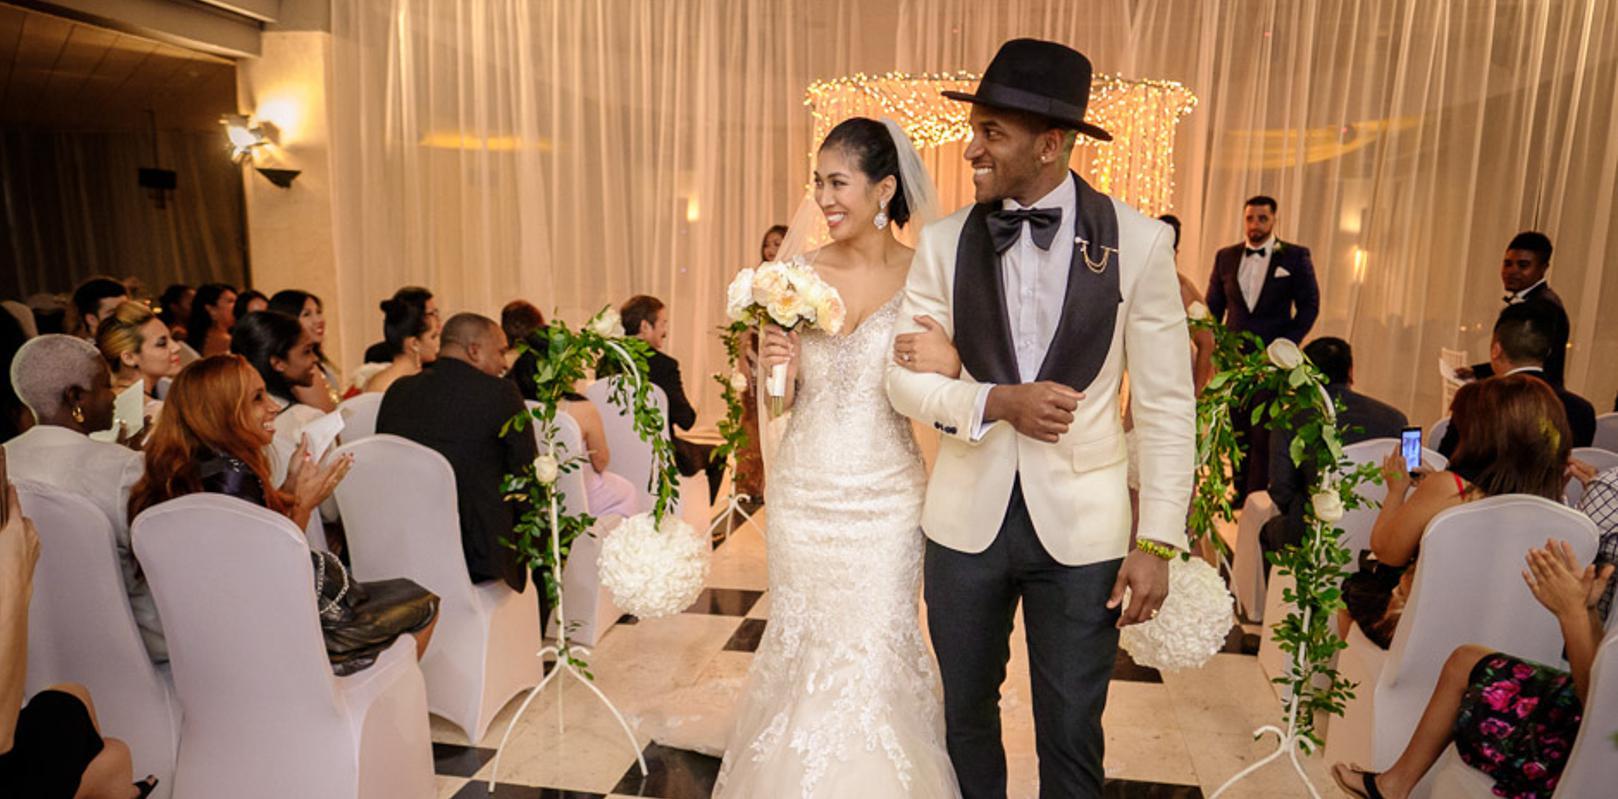 bodas-sin-clasificar-sin-tema-cuba-41412.jpg